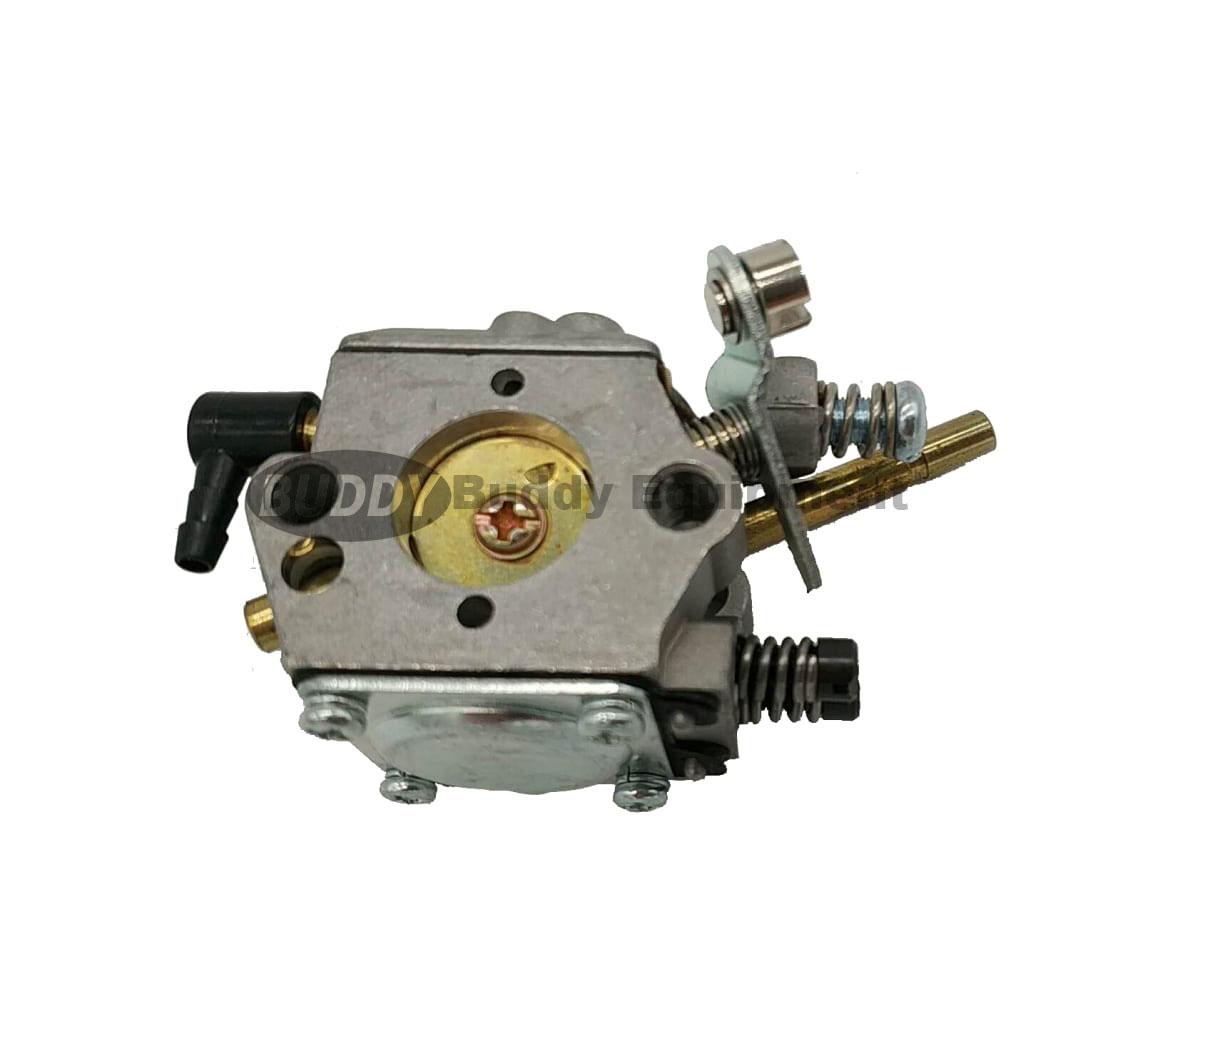 40747 - Carburetor for Stihl – Buddy Equipment